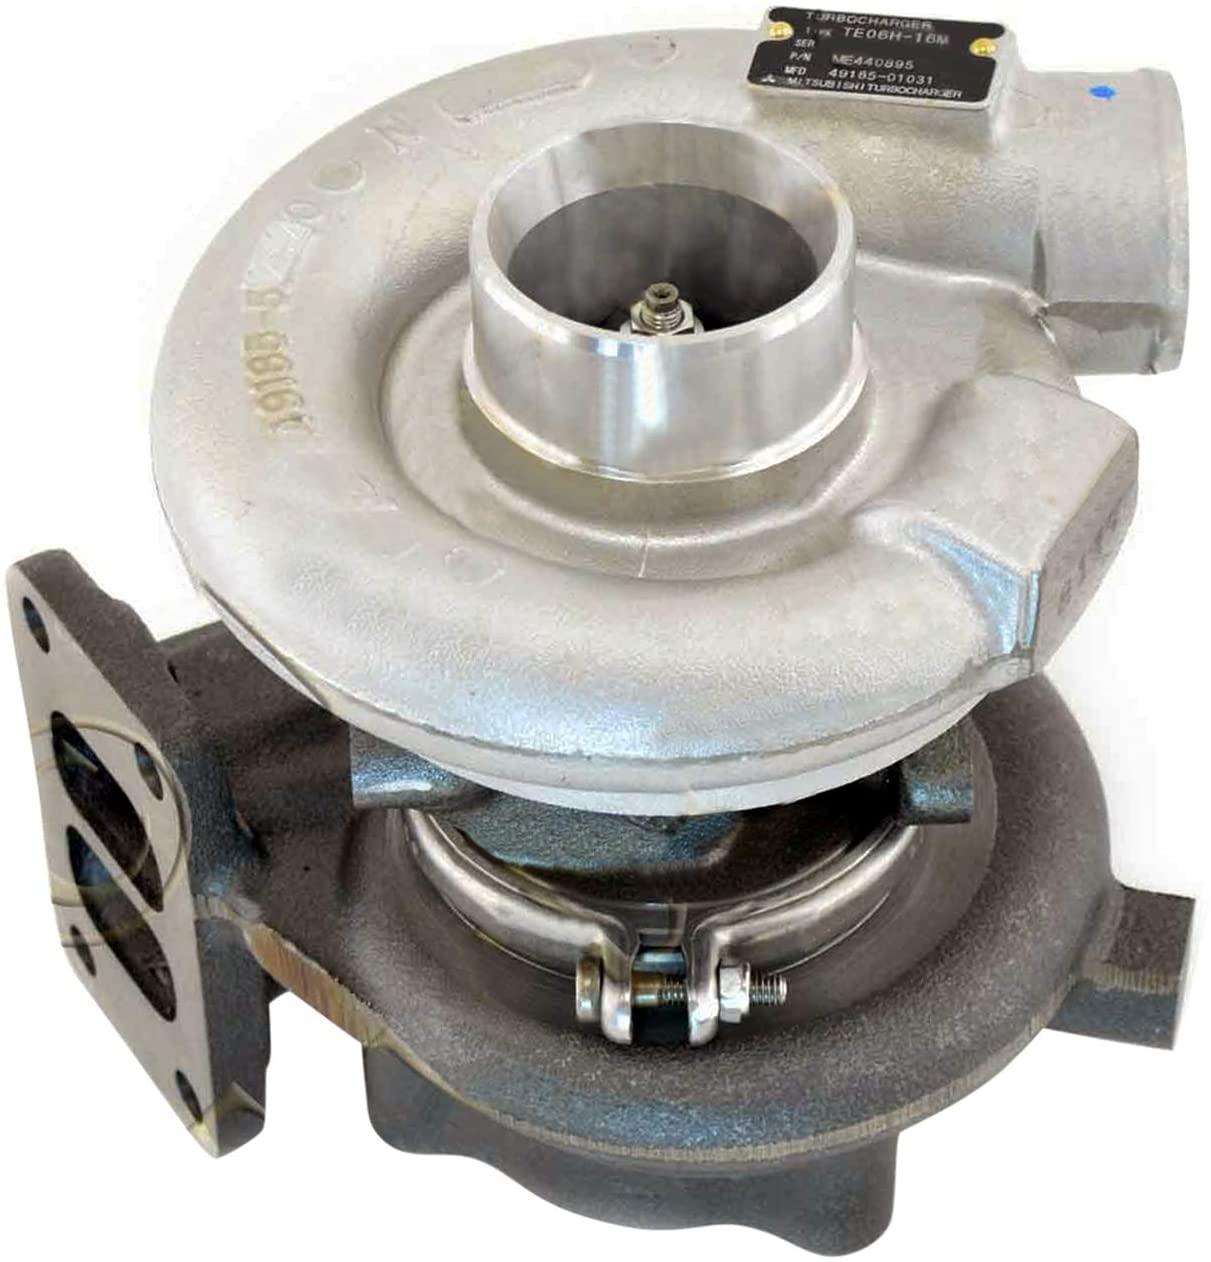 Weelparz Turbo TE06H-16M Turbocharger VAME440895 ME440895 For New Holland Excavator E215 EH215 Mitsubishi Kobelco SK200 235SR SK235SR-1E Engine 6D34 6D34TL